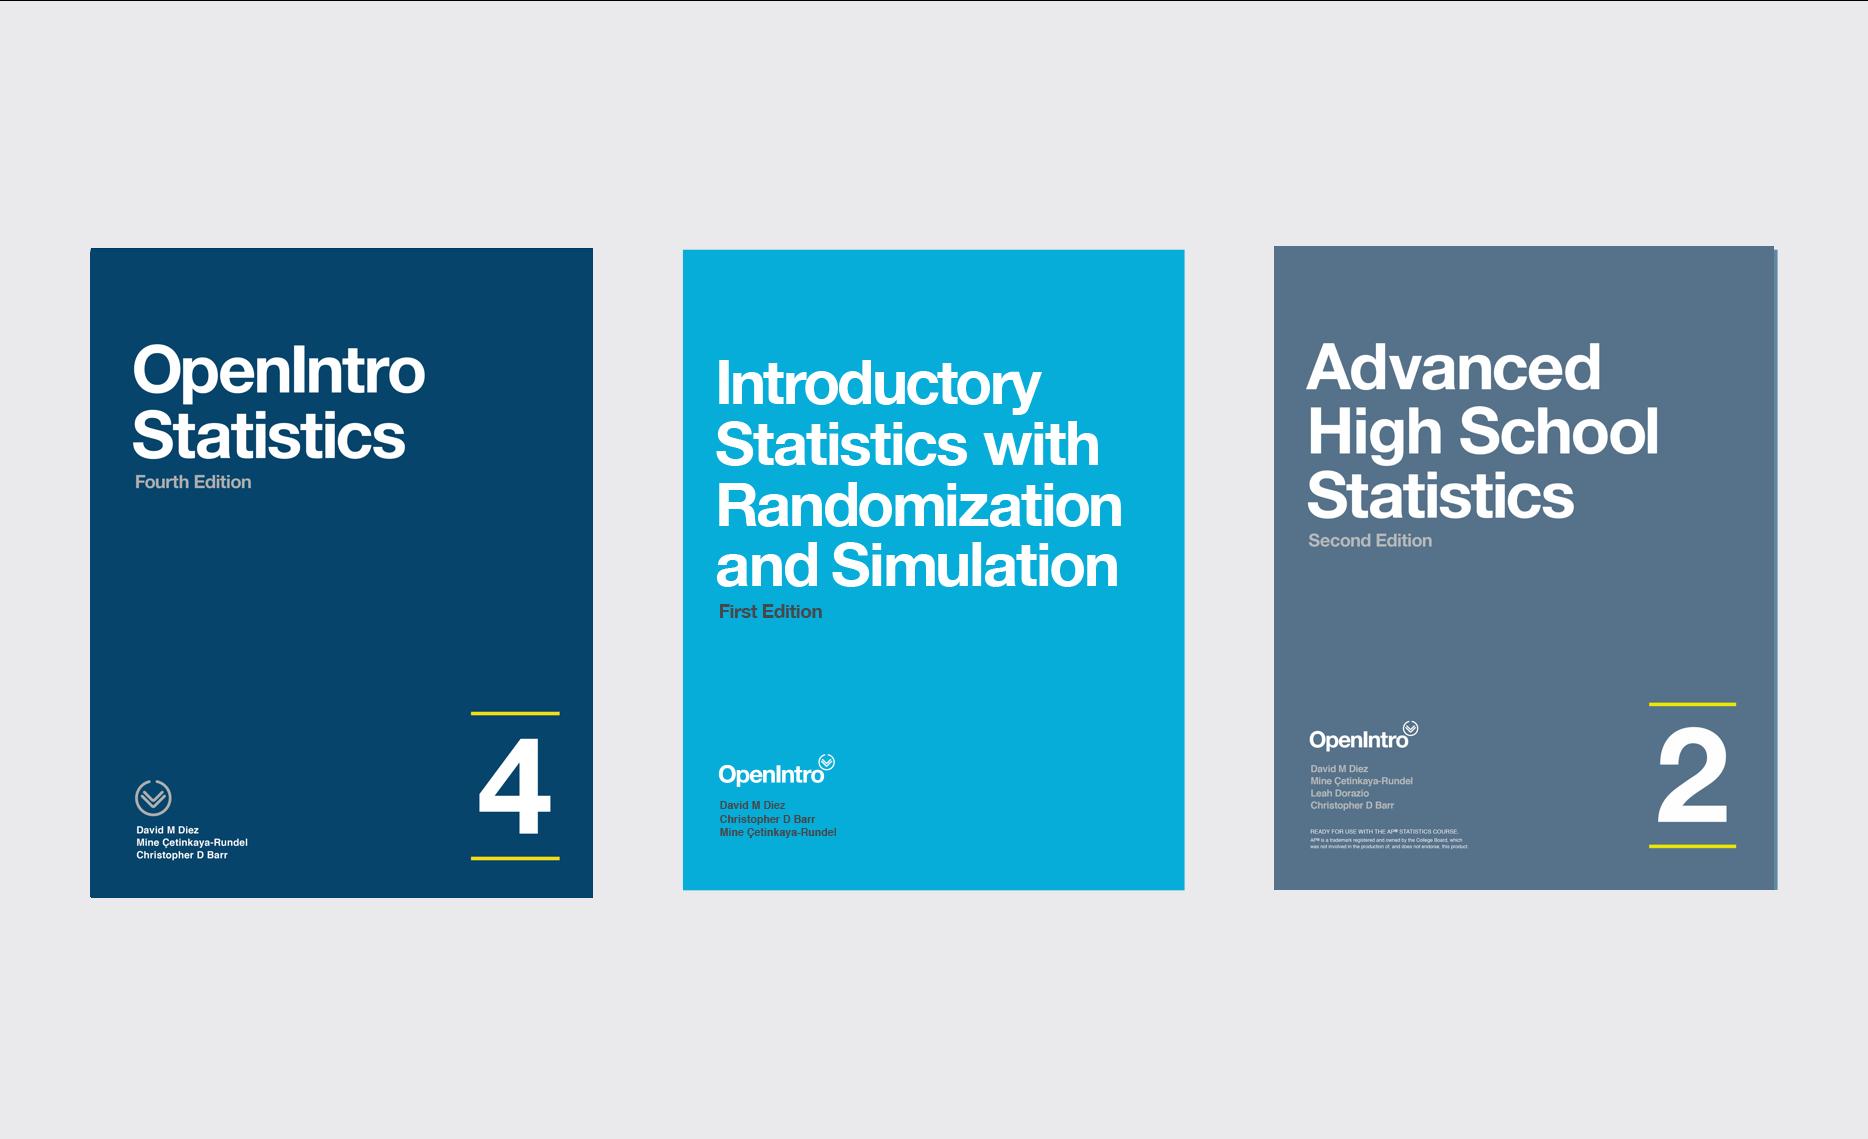 OpenIntro Statistics